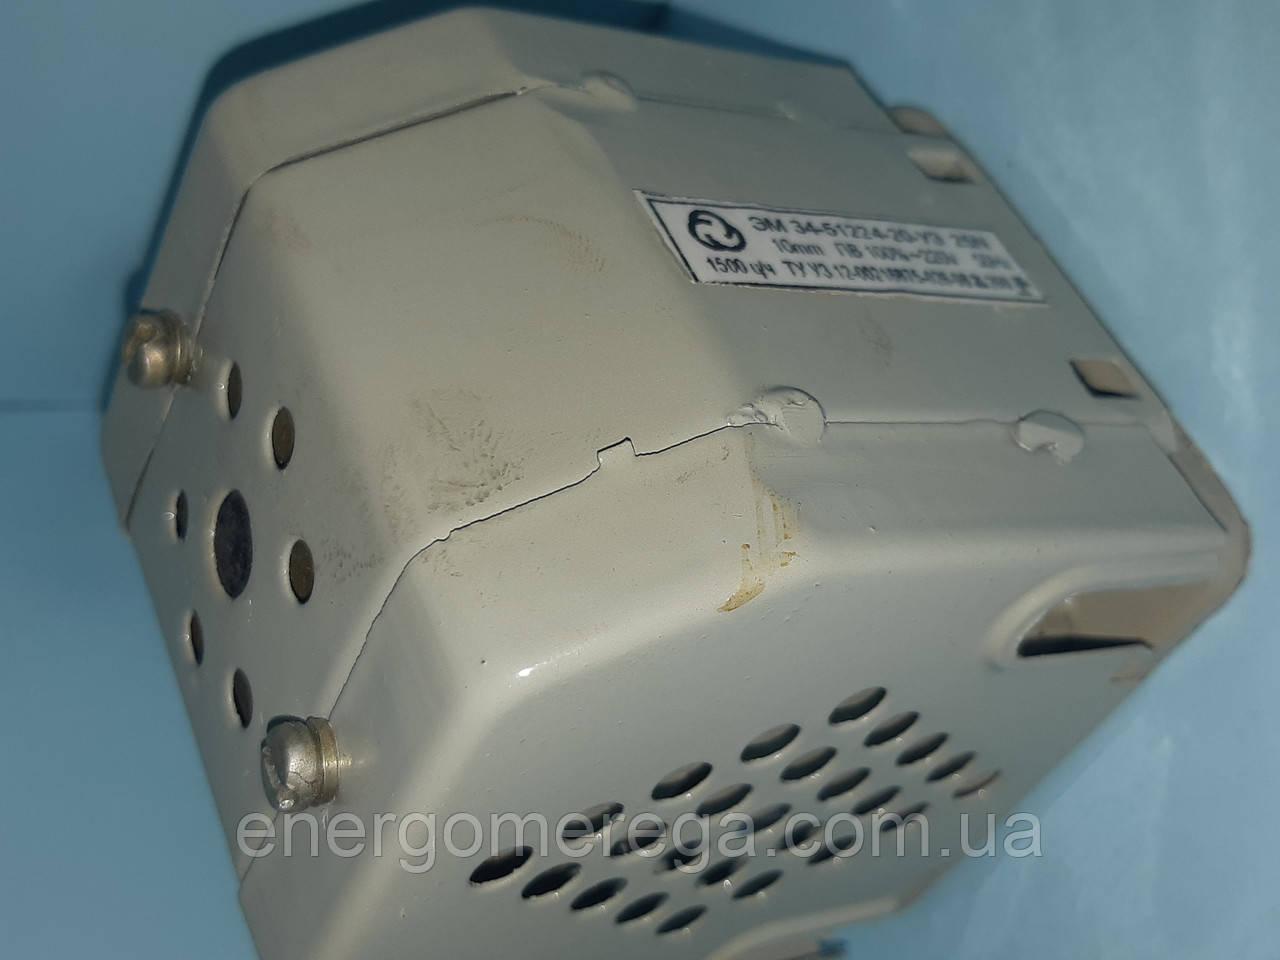 Электромагнит ЭМ 34-51261 110В